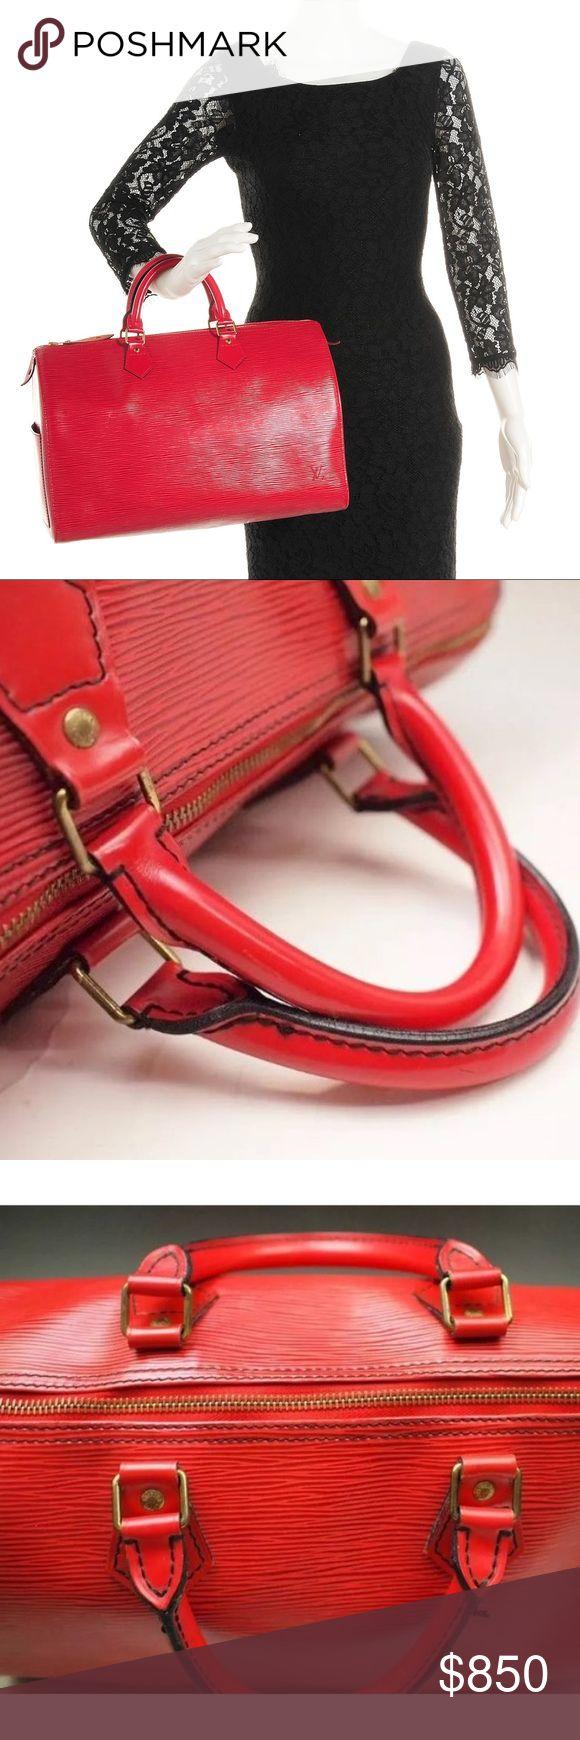 Authentic Louis Vuitton leather Speedy 35 Authentic Louis Vuitton Speedy 35, red Louis Vuitton Bags Satchels